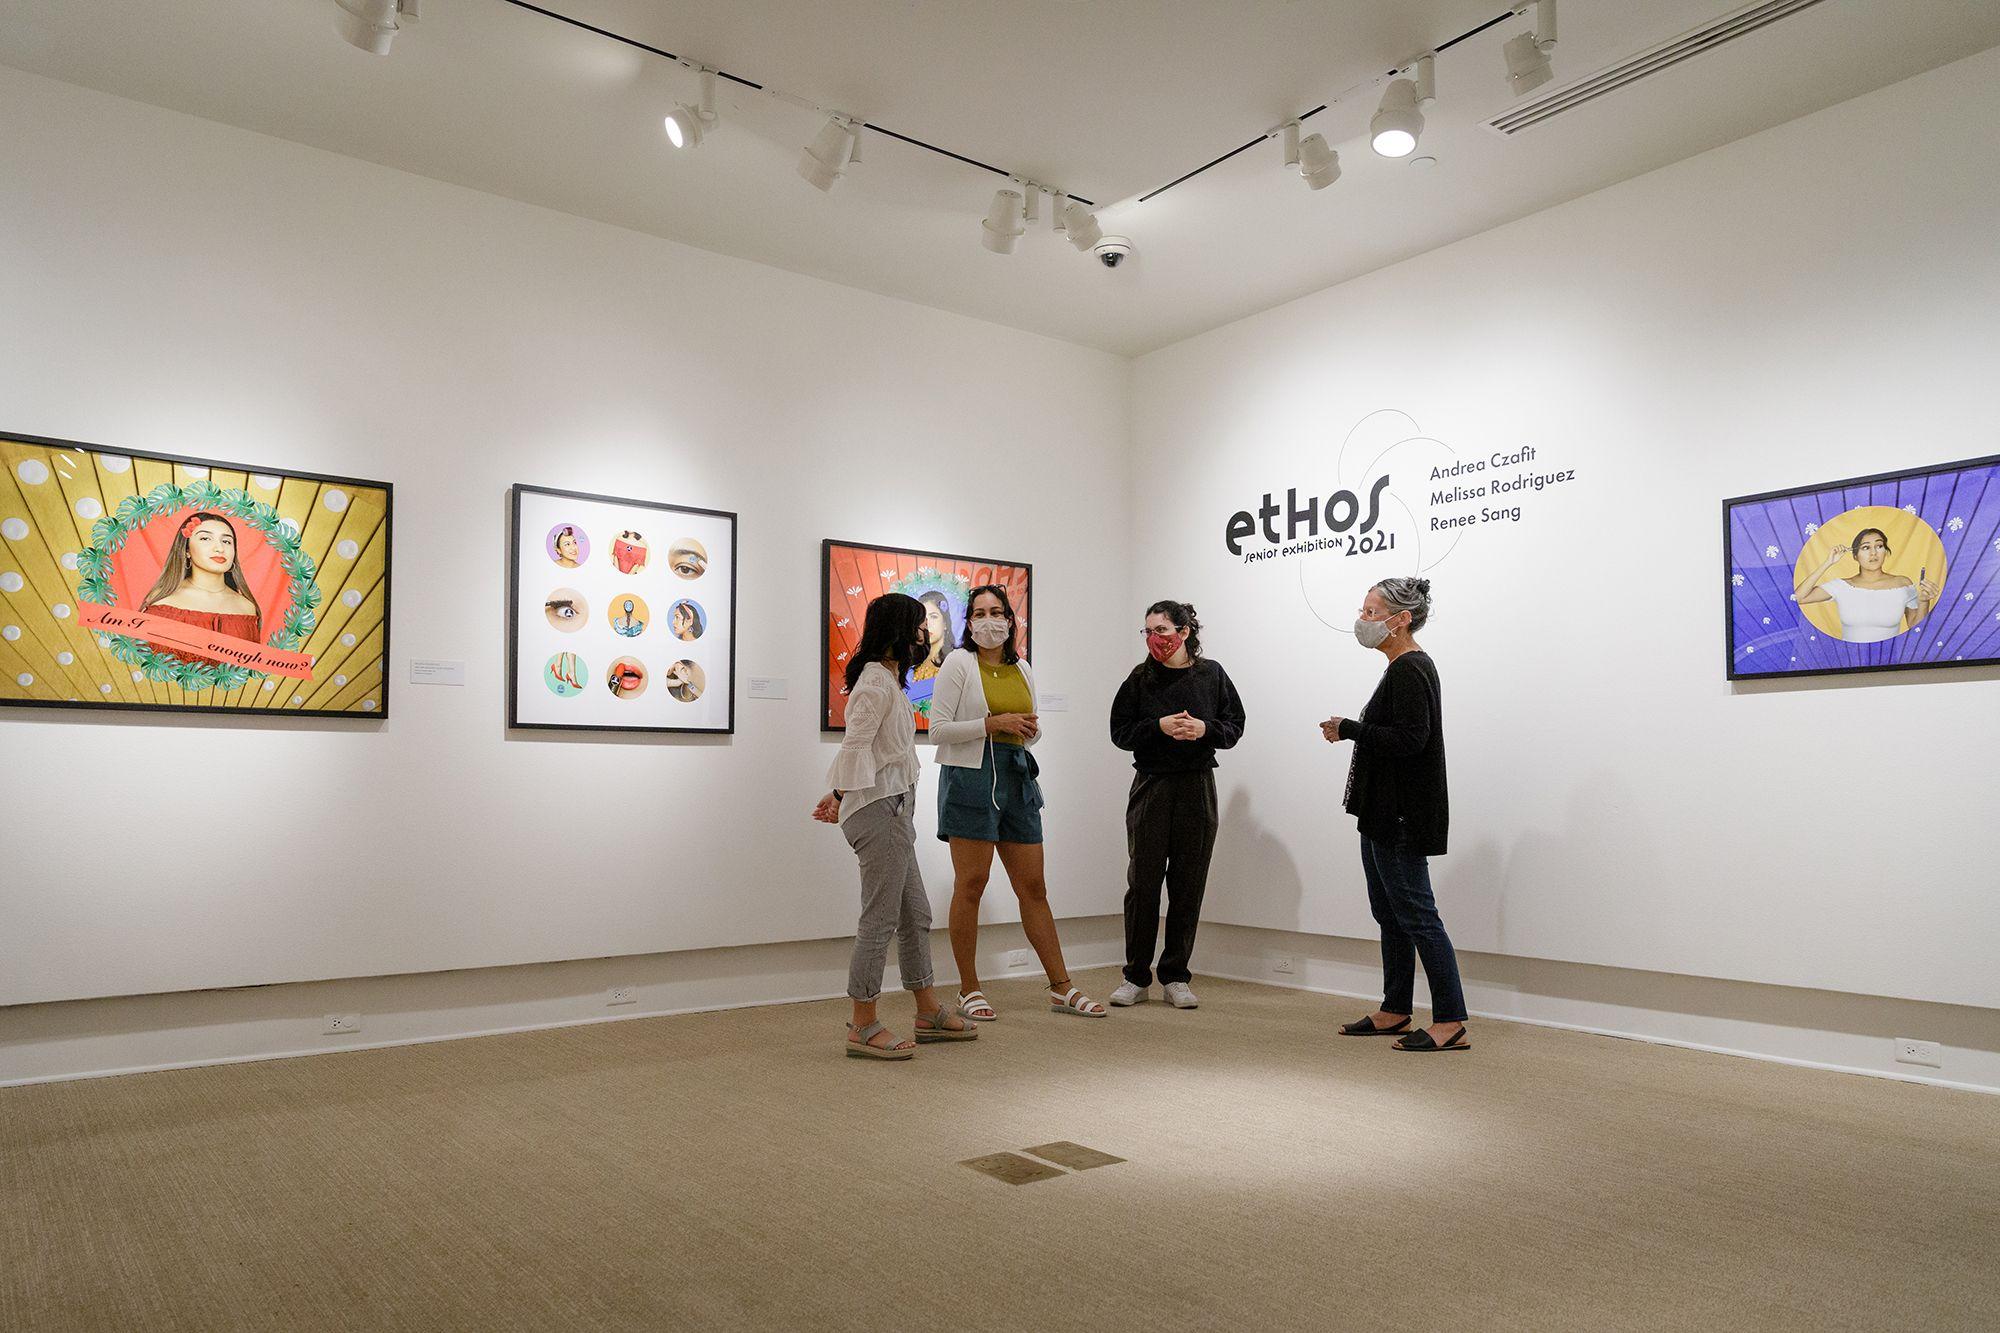 Senior art students put on an original art exhibition at Rollins' Cornell Fine Arts Museum.